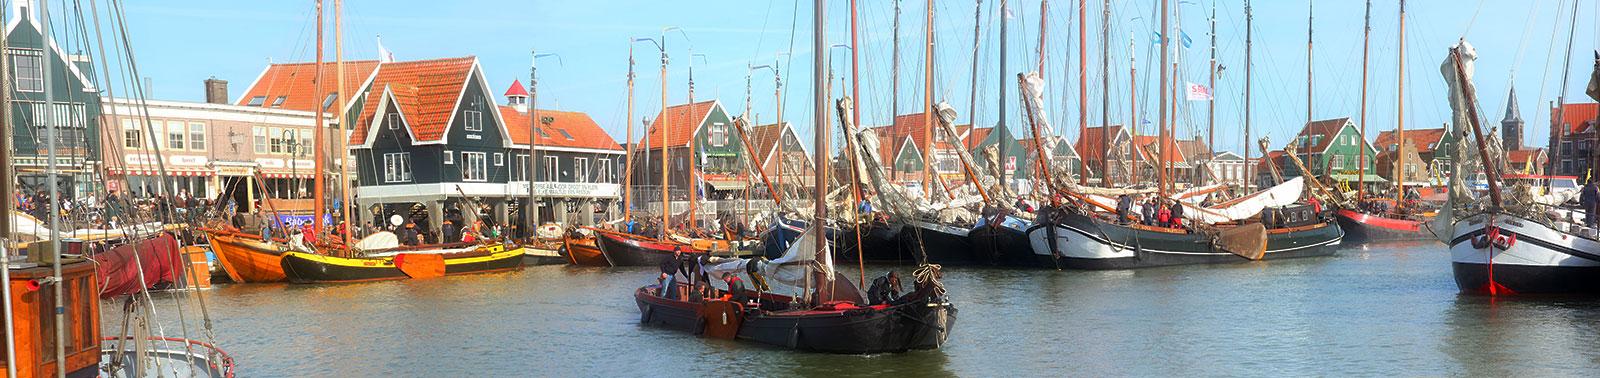 Volendam port